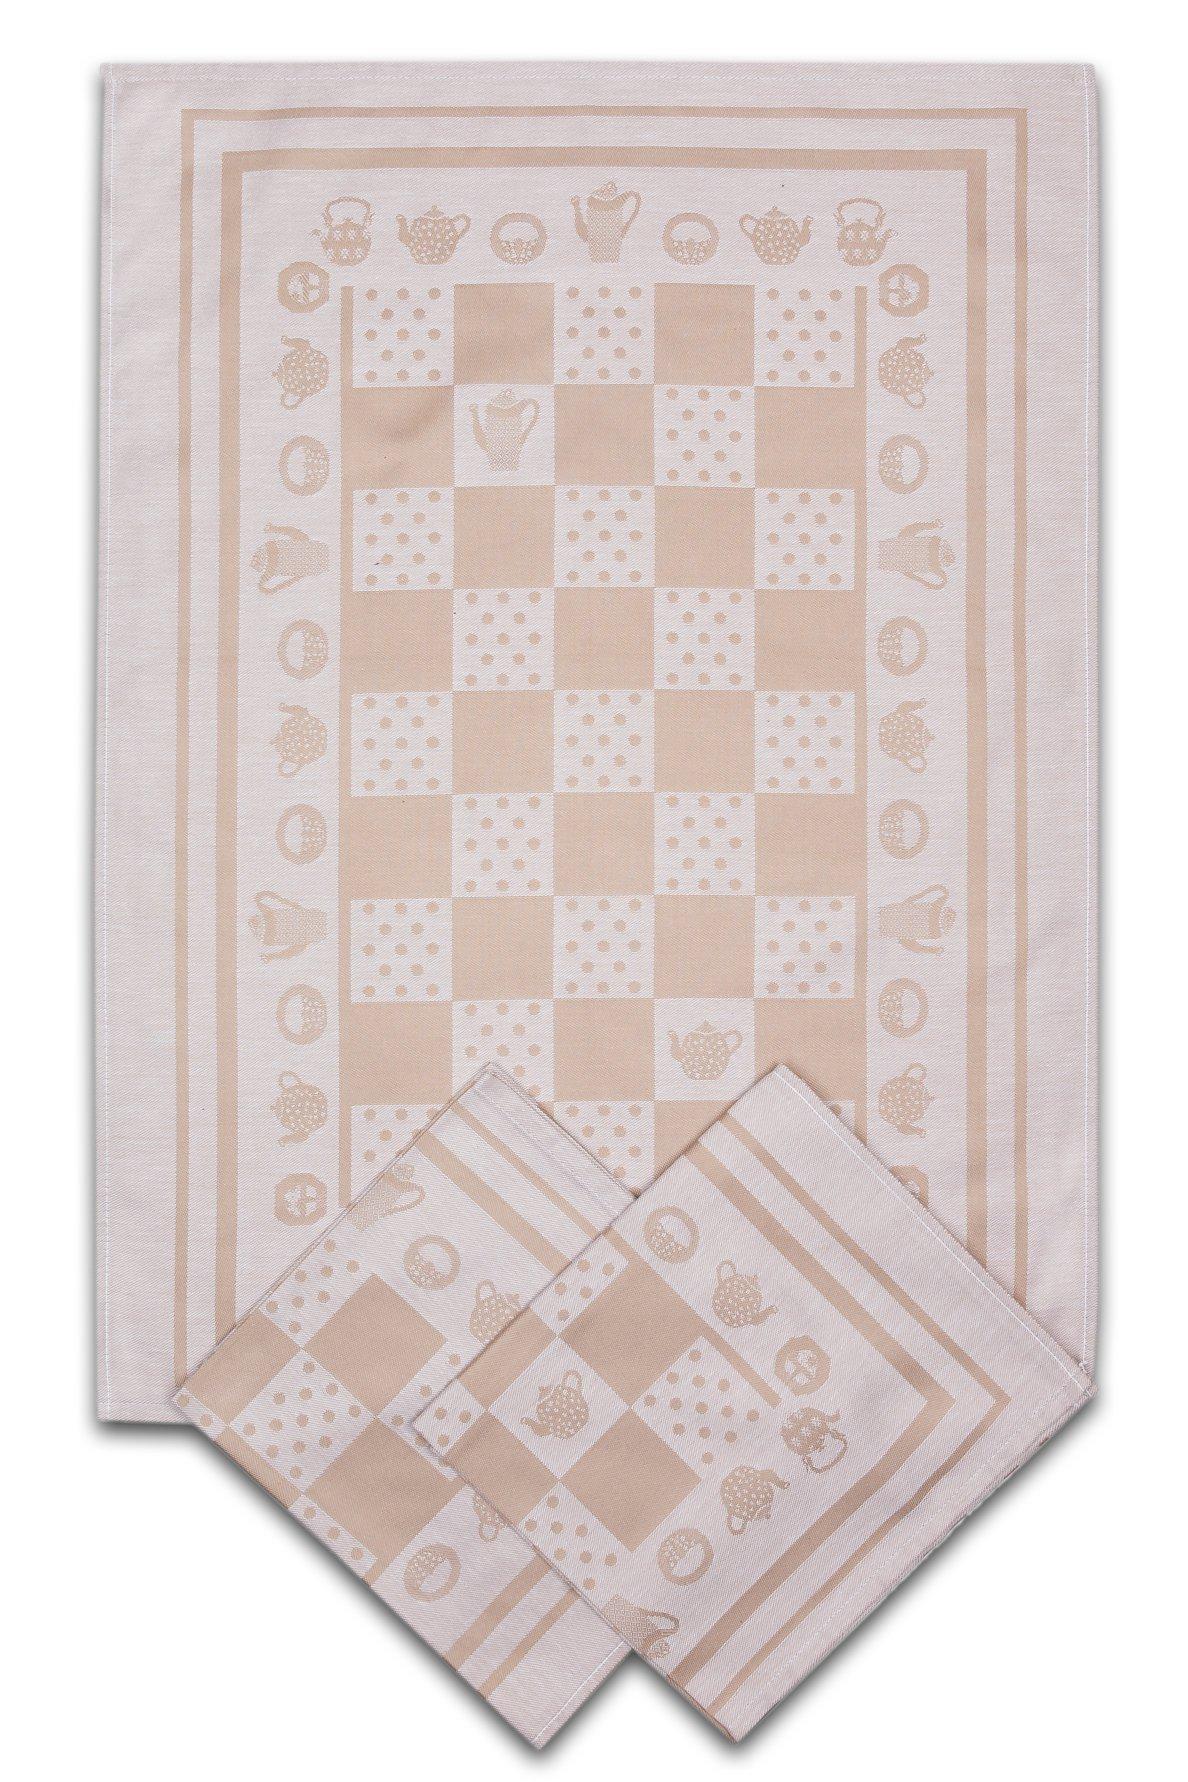 Svitap utěrky egyptská bavlna KONVIČKA/PUNTÍK 50x70cm 3ks - BÉŽOVÁ